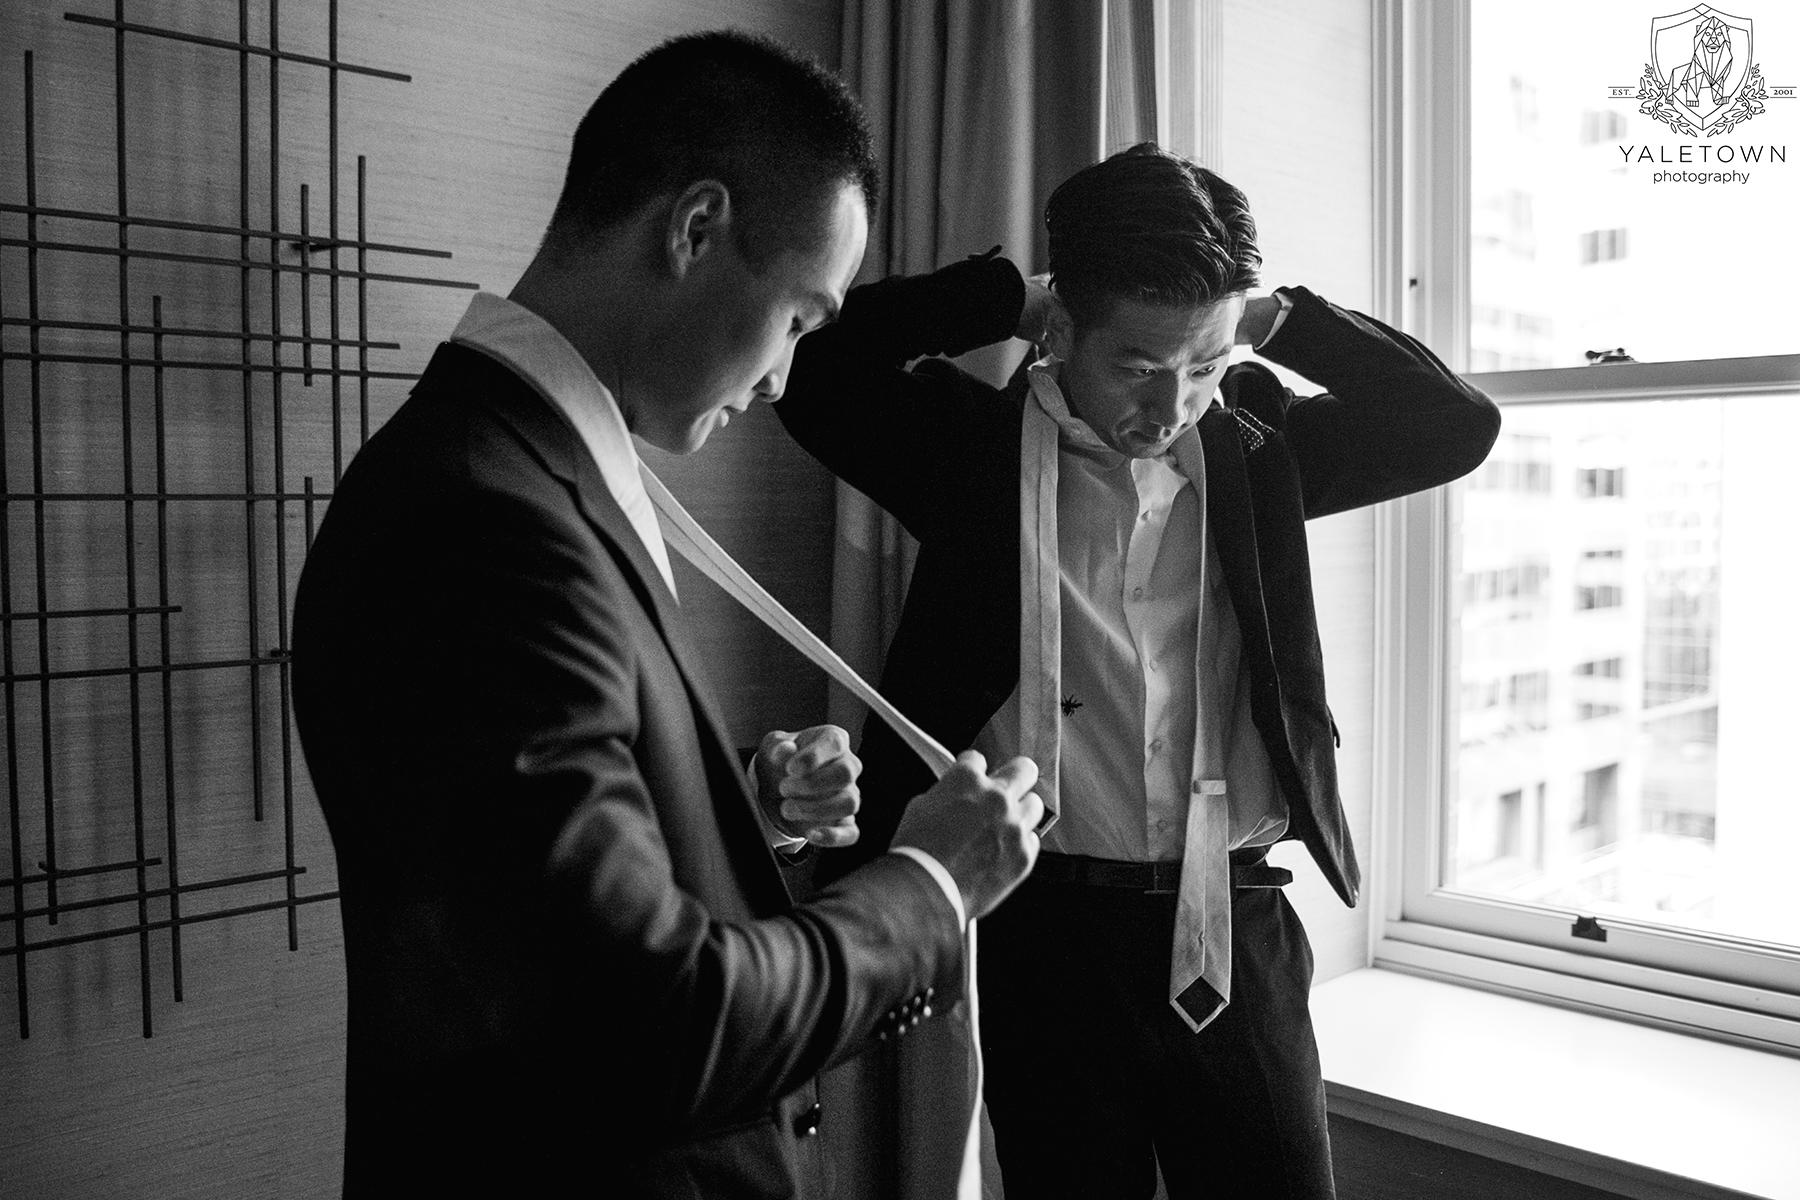 Groomsmen-Prep-Rosewood-Hotel-Georgia-Vancouver-Wedding-Yaletown-Photography-photo